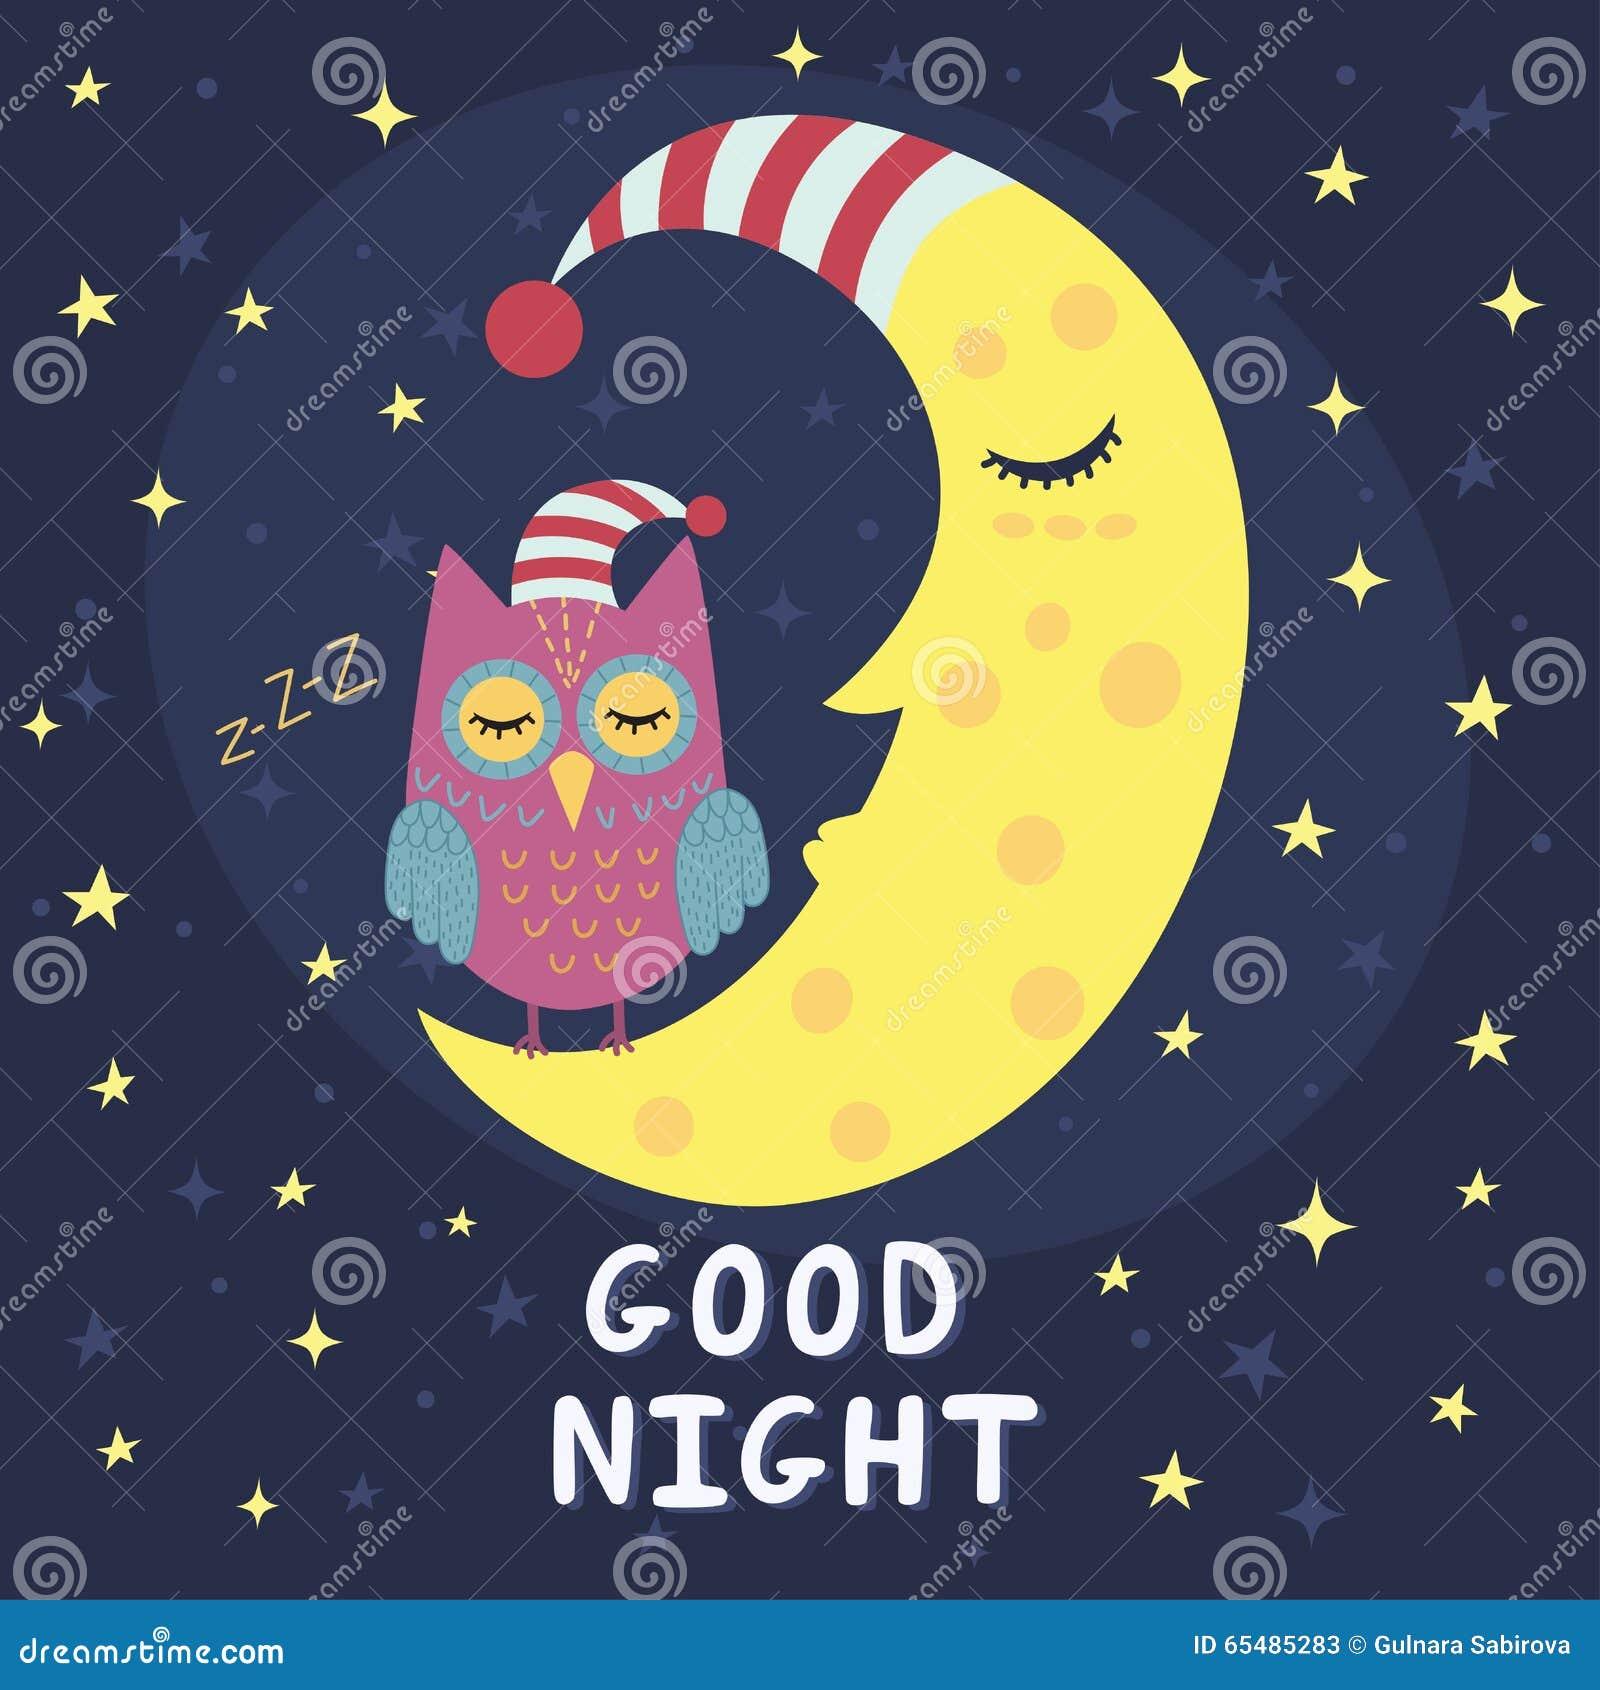 good night card with sleeping moon and cute owl stock vector